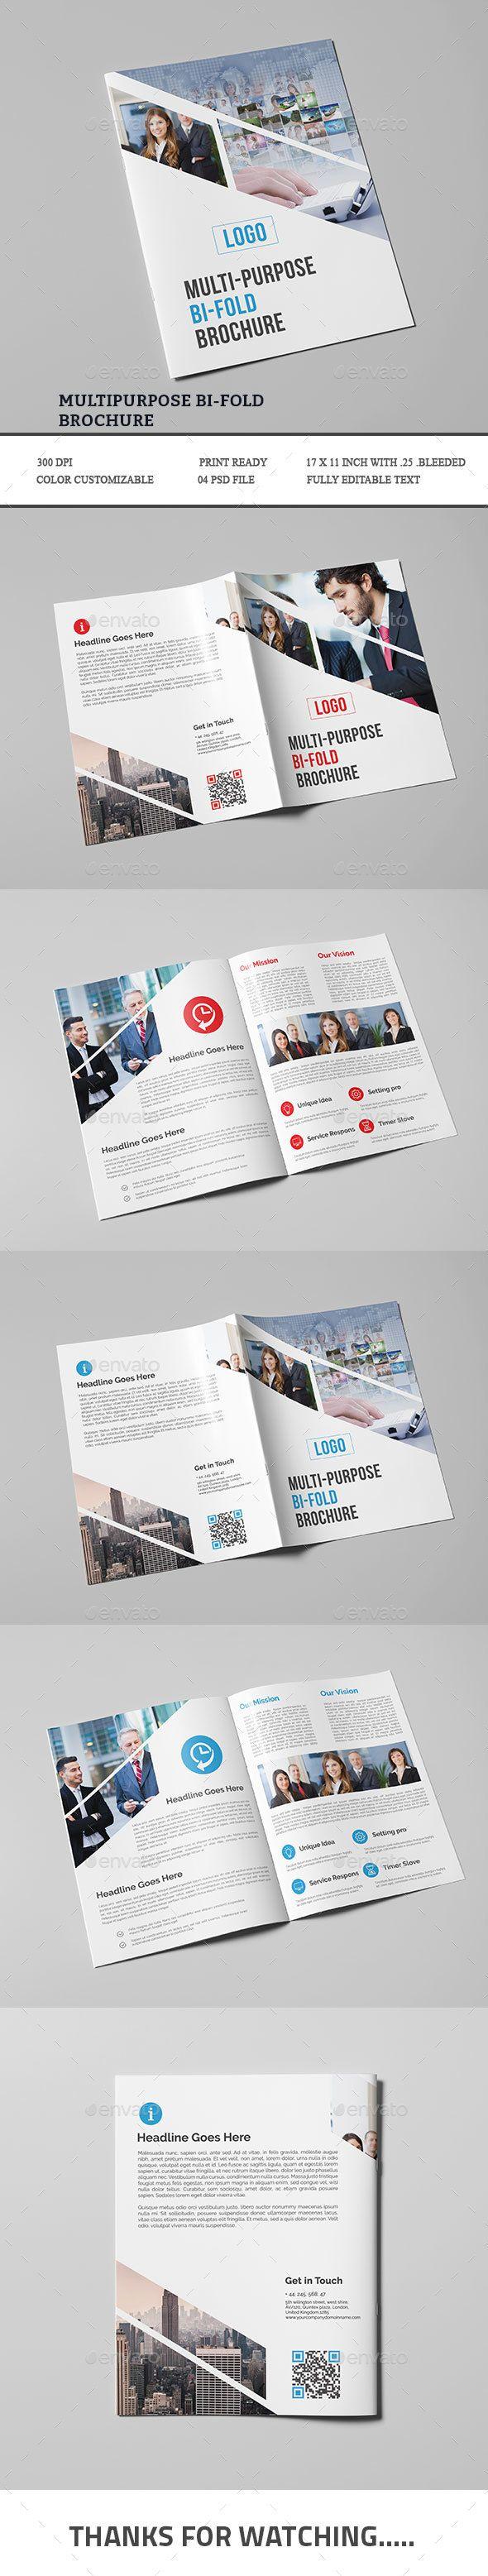 proposal report template%0A Multipurpose Bifold Brochure